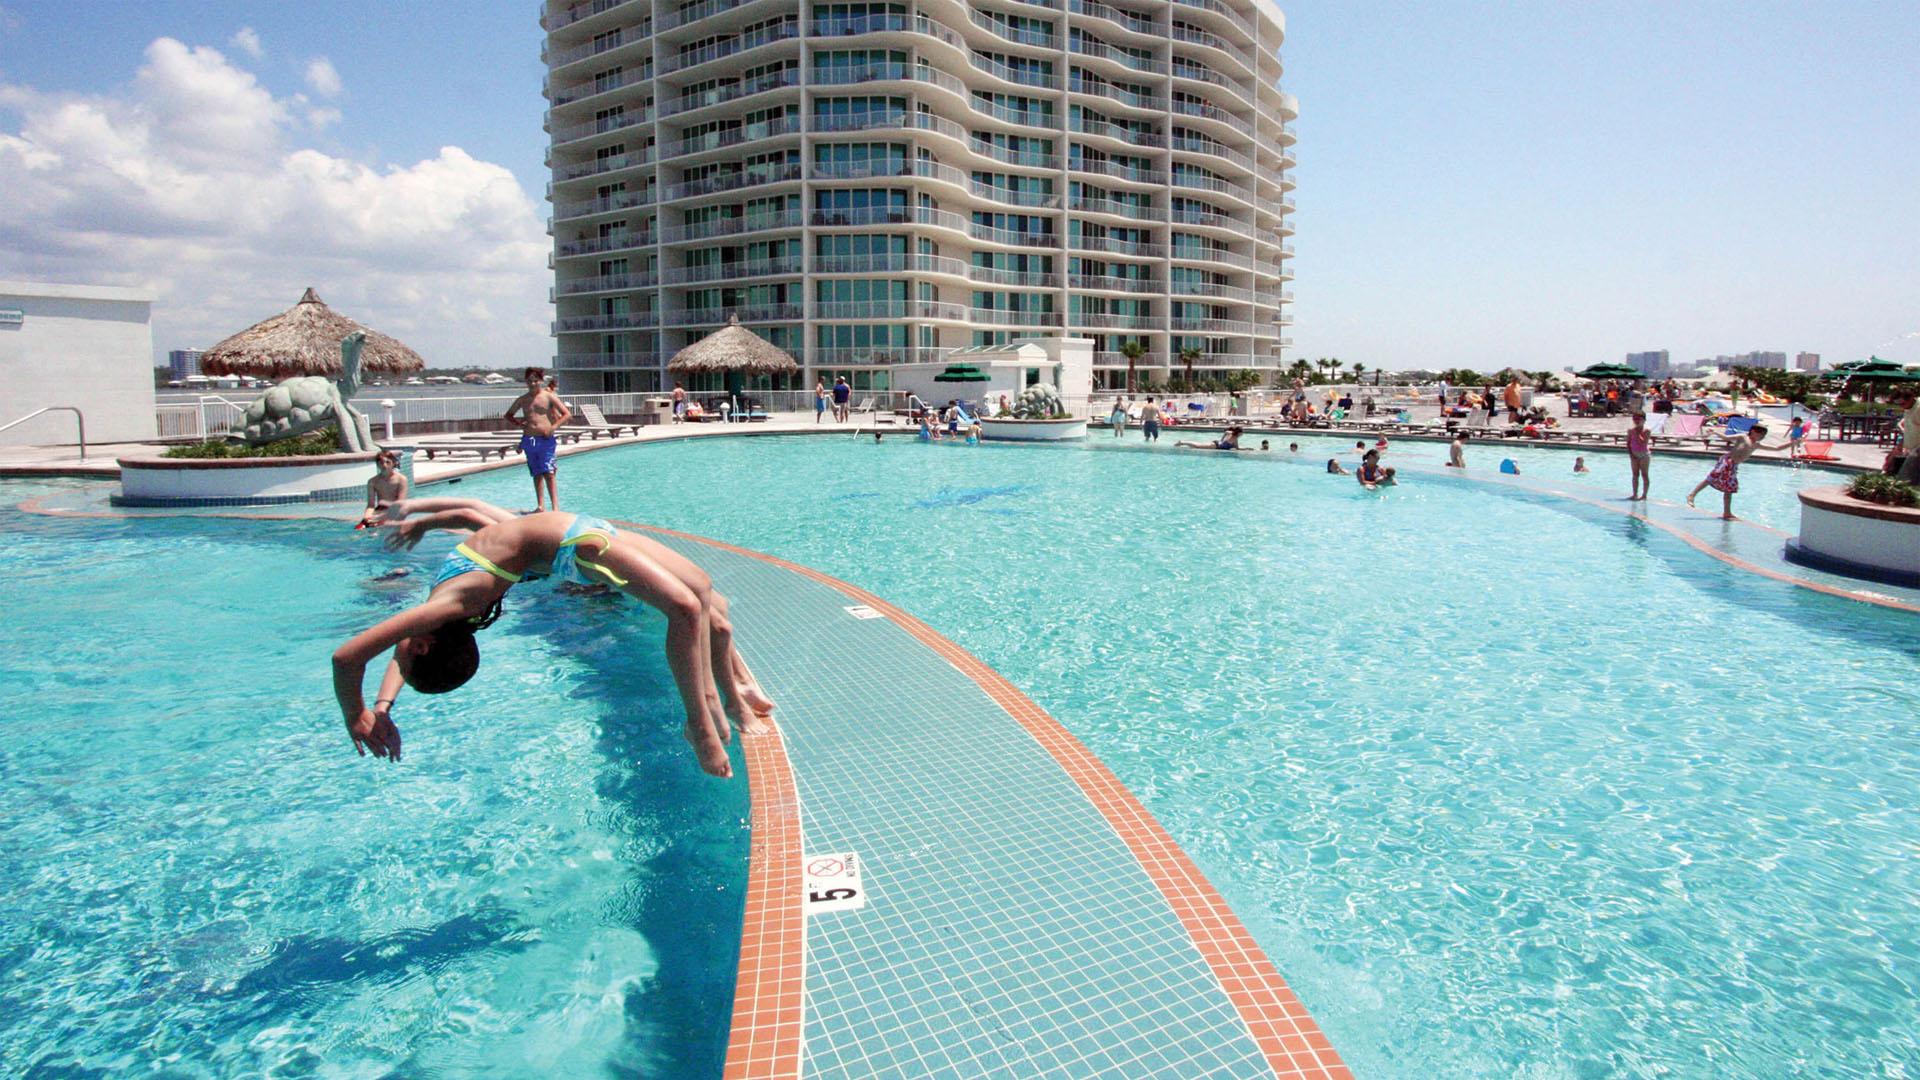 Upper Pool Deck Tiered Pools